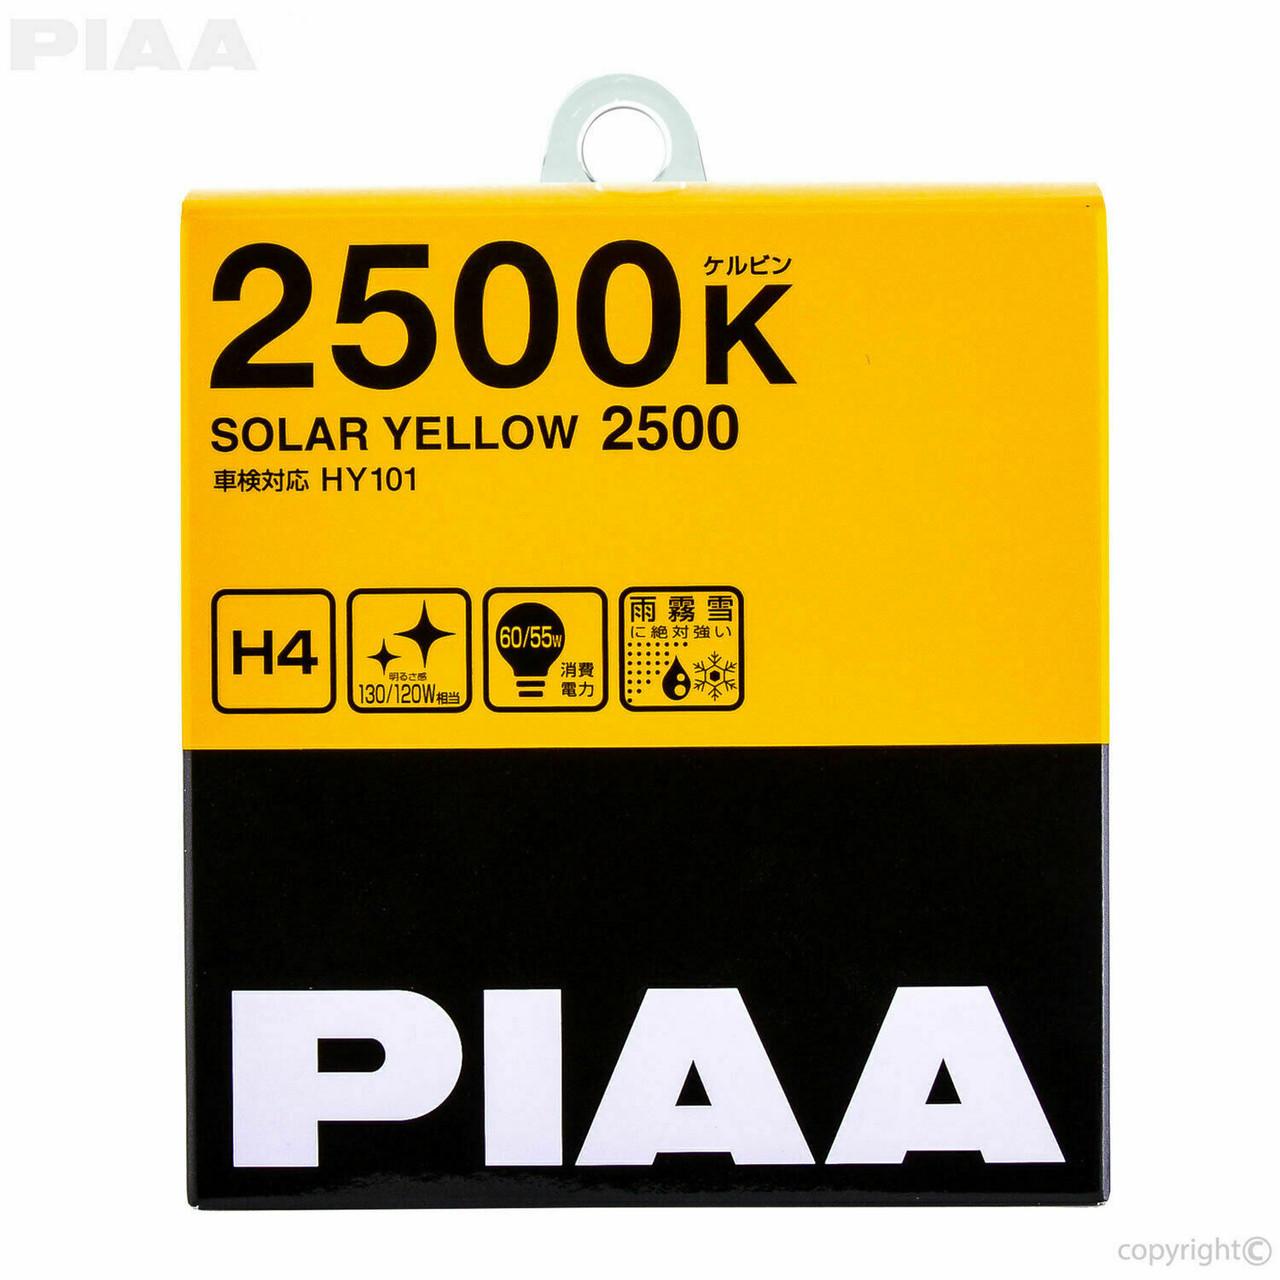 PIAA H4 2500K Solar Yellow Gold 60/55w = 130/120w XTRA Bulb Set from Japan